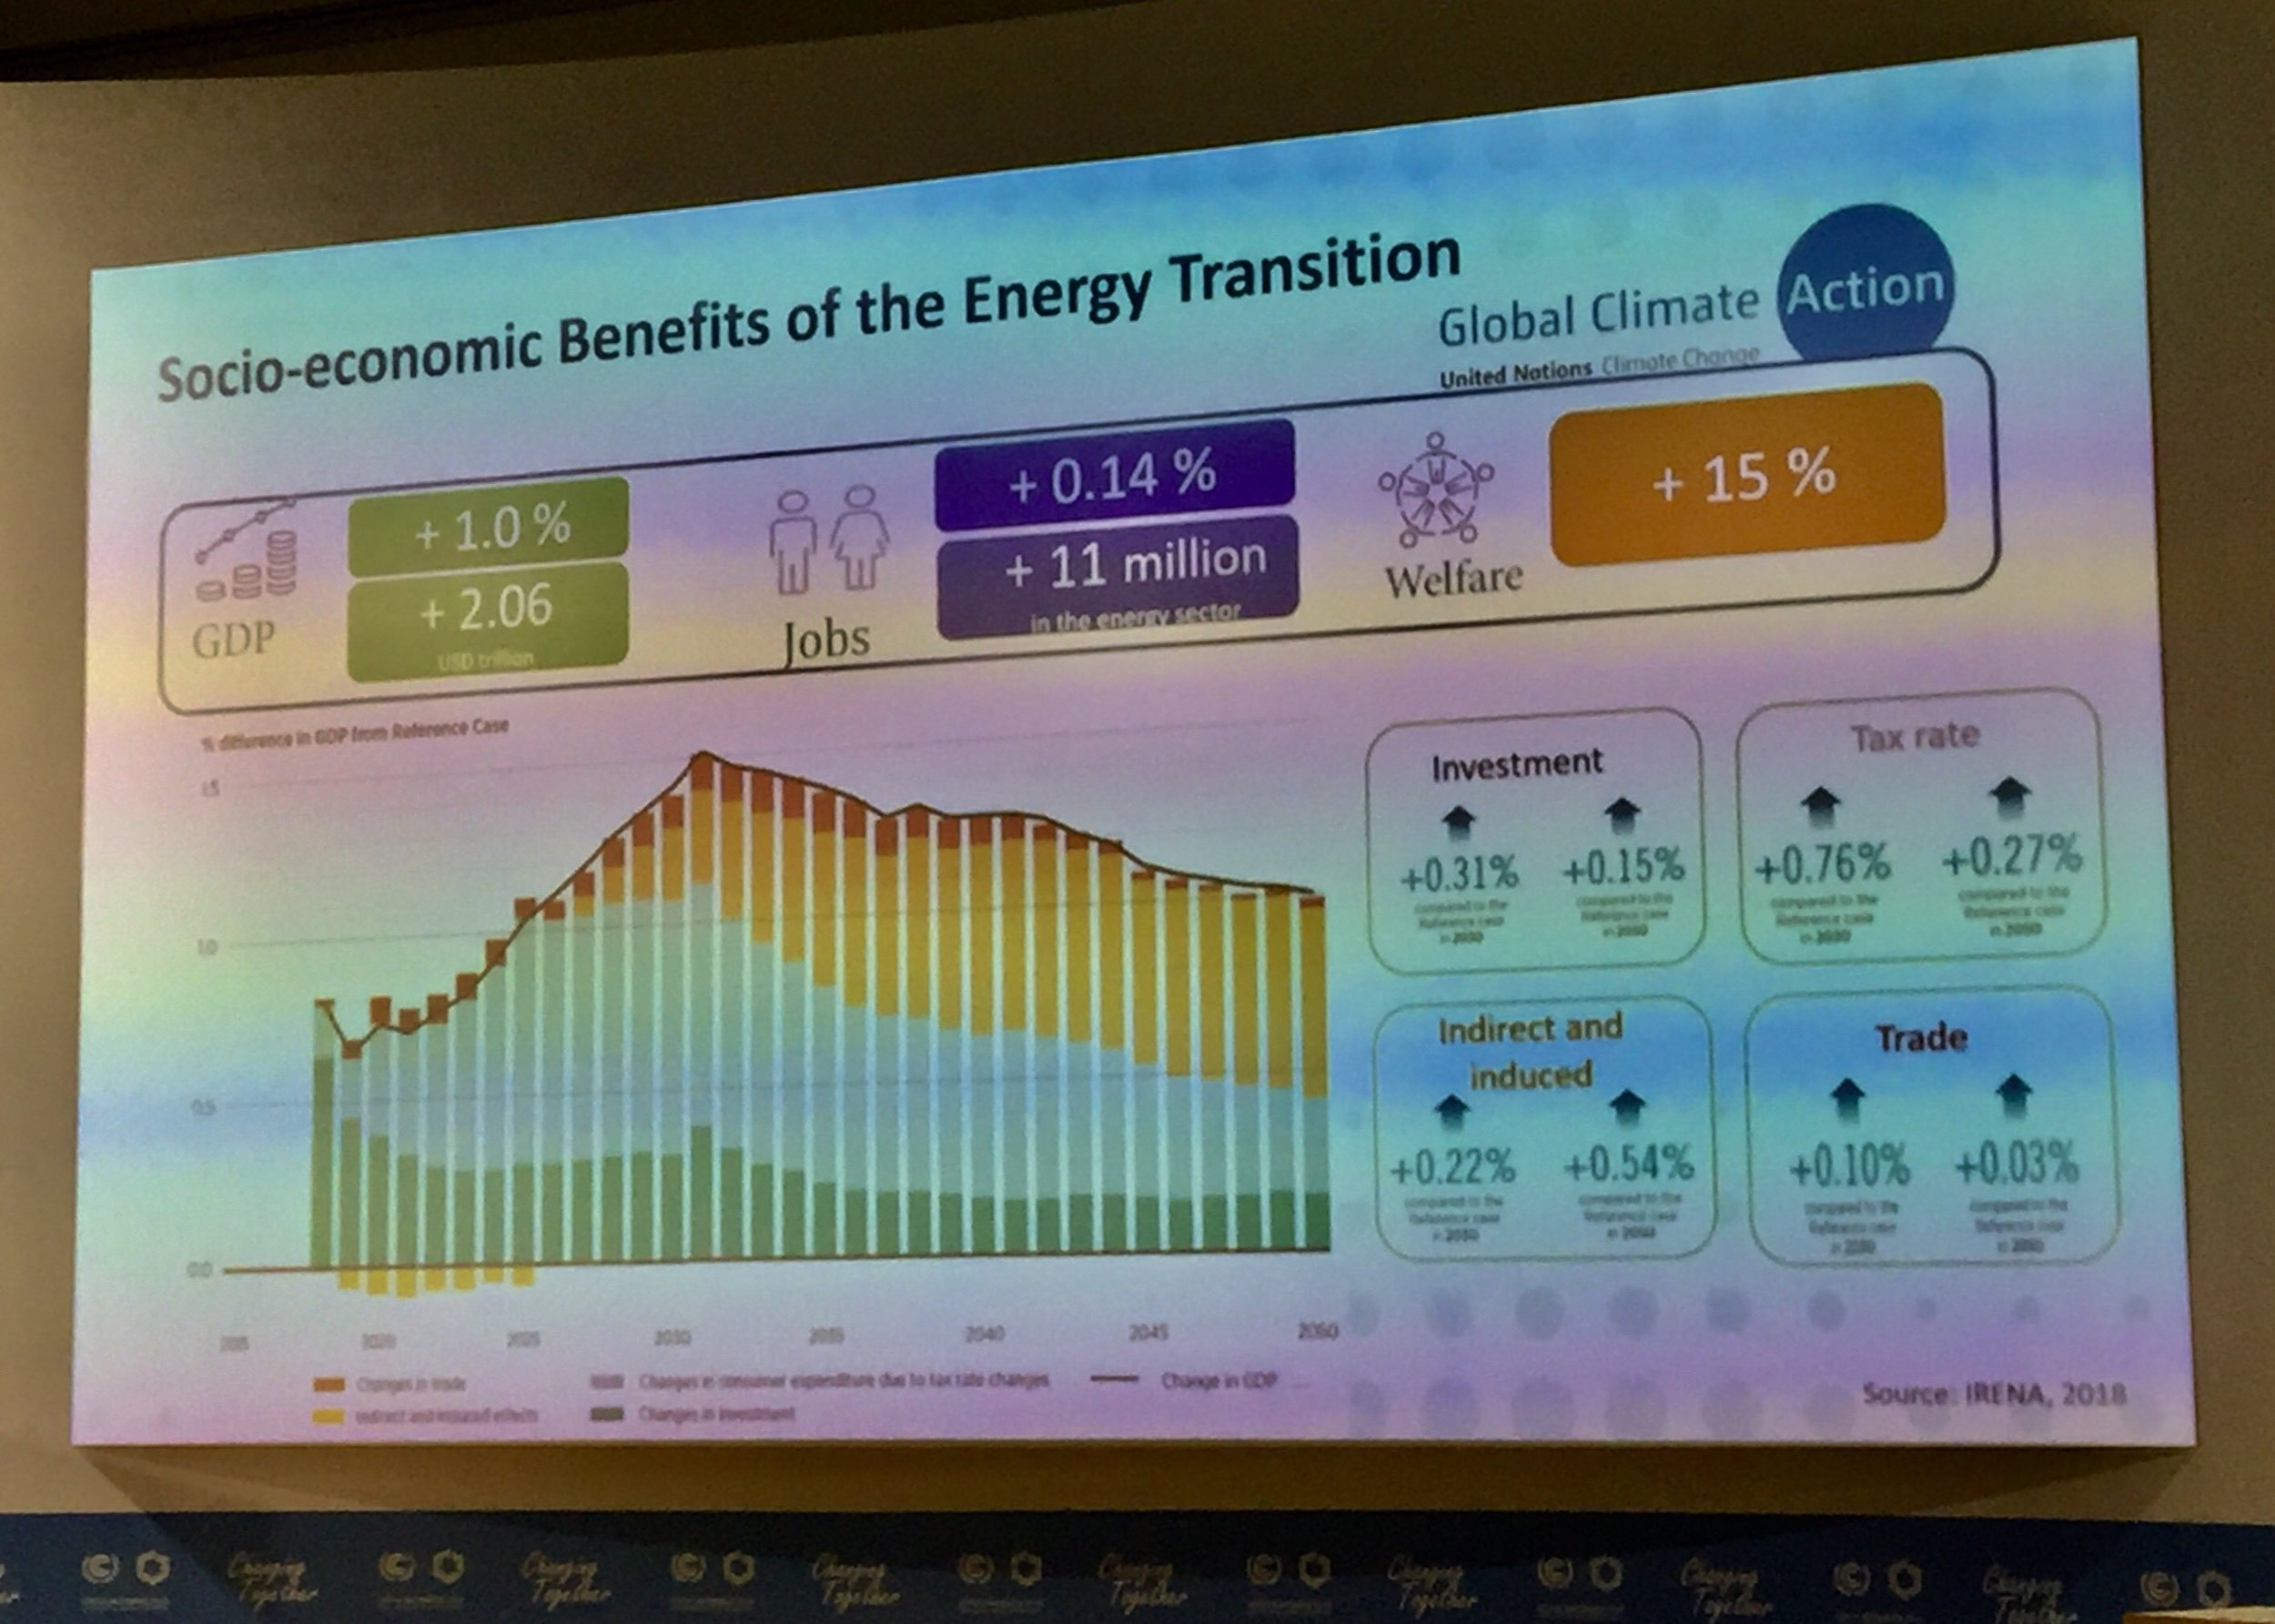 IRENA's new report shows positive socio-economic benefits of the energy transition.